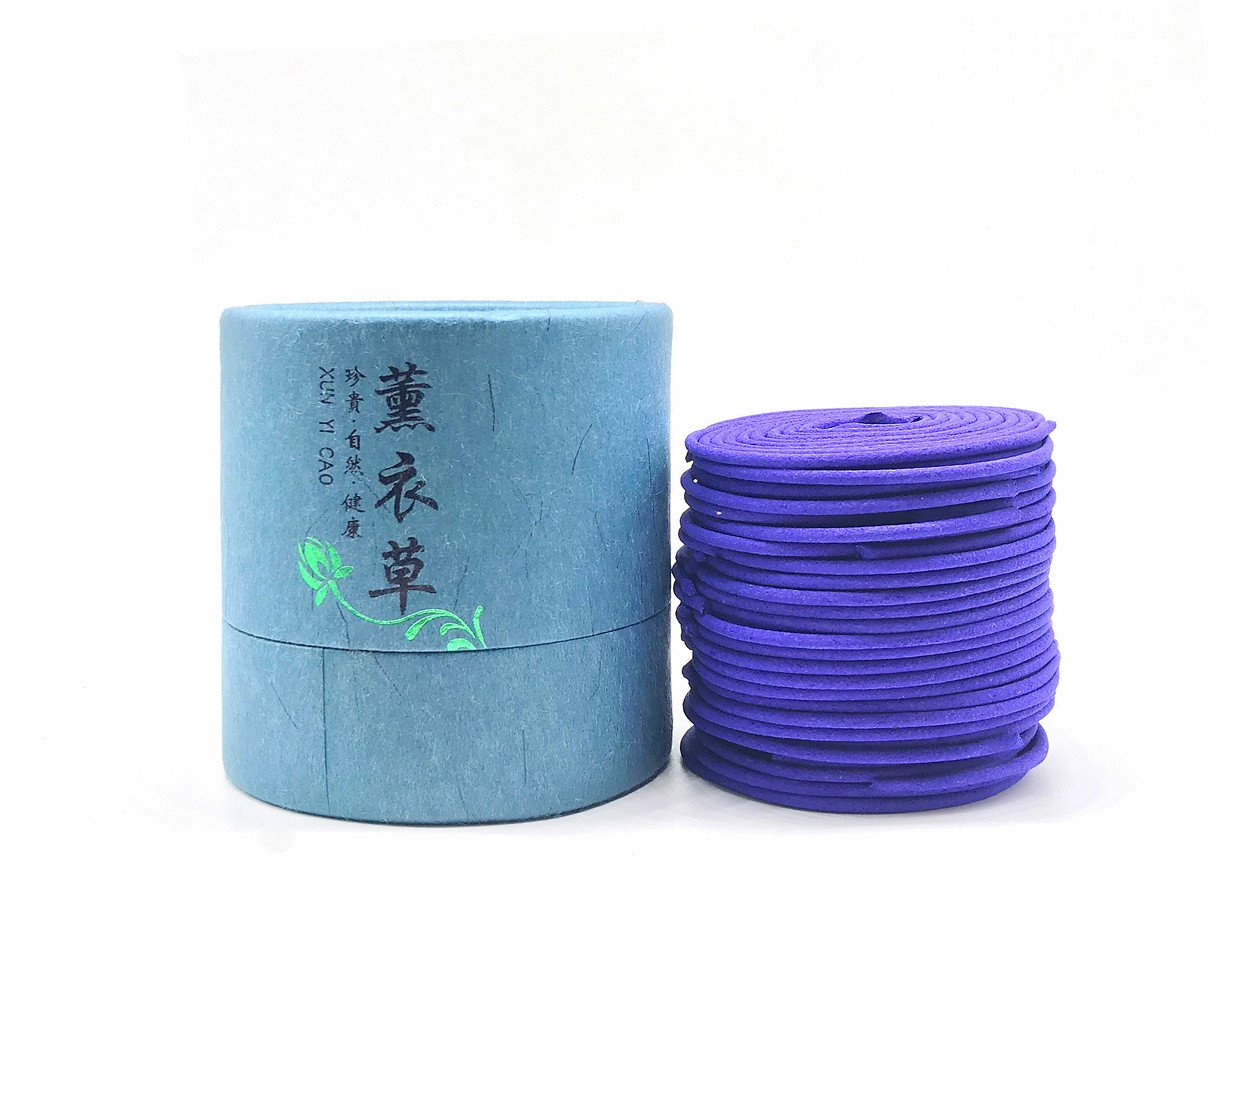 OTOFY Lavender Incense Coil, Set of 48 Coils, lasting Pleasant Fragrant Line incense (Lavender)